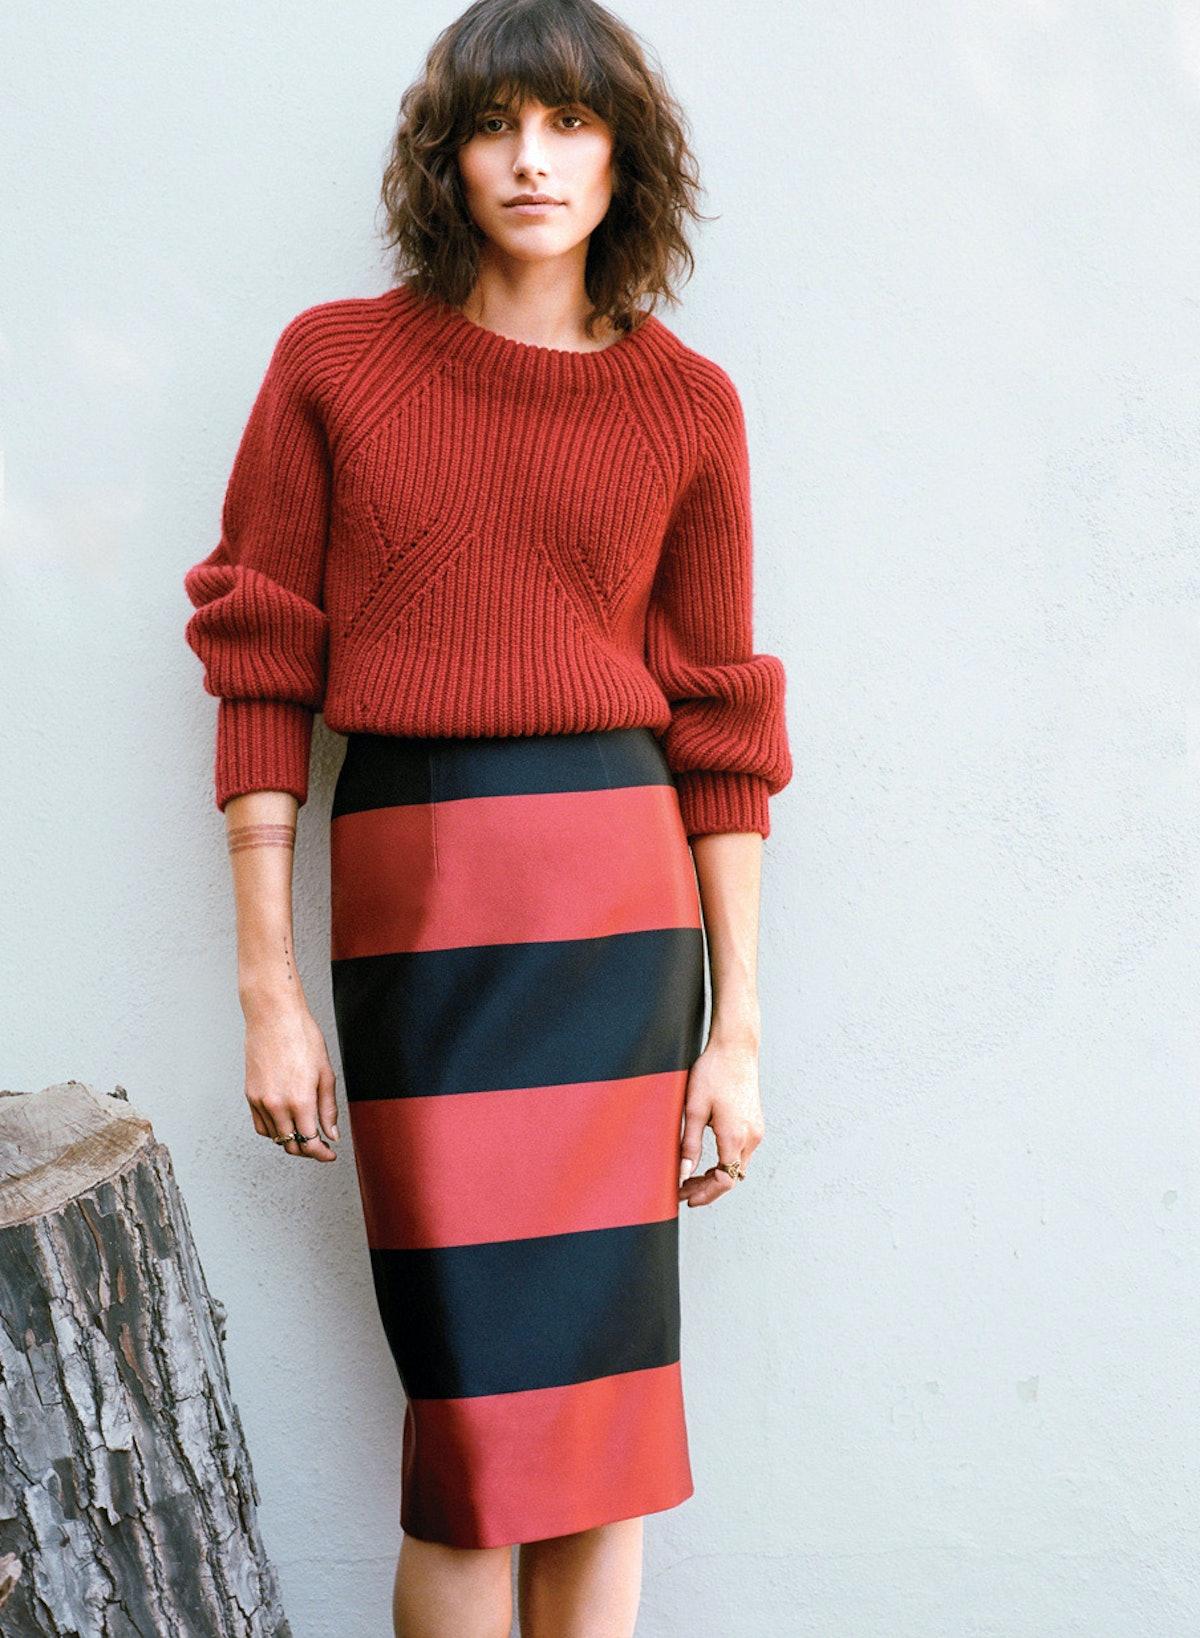 langley-fox-it-girl-stripes-trend-01